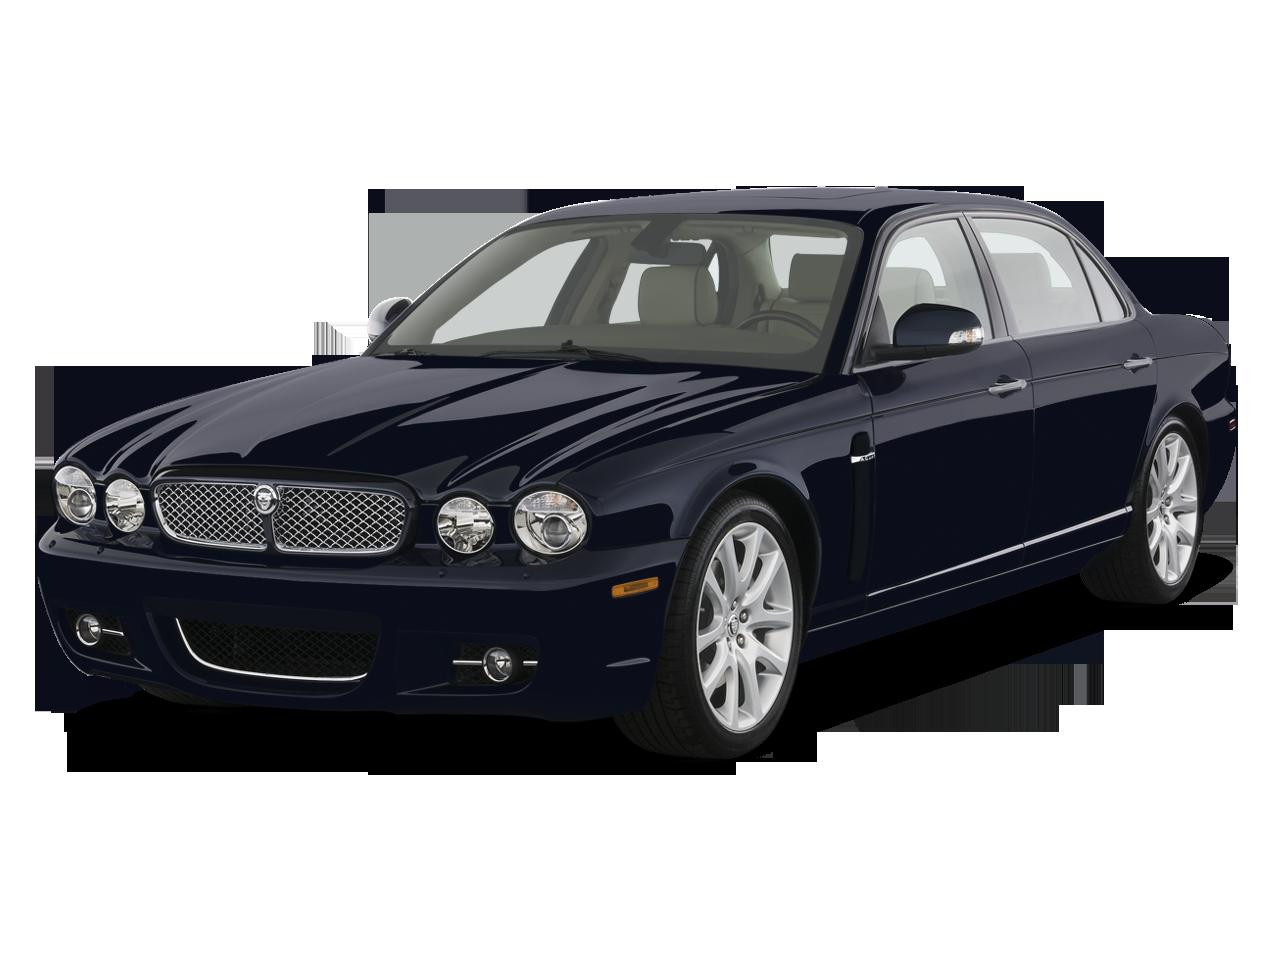 2008 jaguar xj vanden plas jaguar luxury sedan review automobile magazine. Black Bedroom Furniture Sets. Home Design Ideas